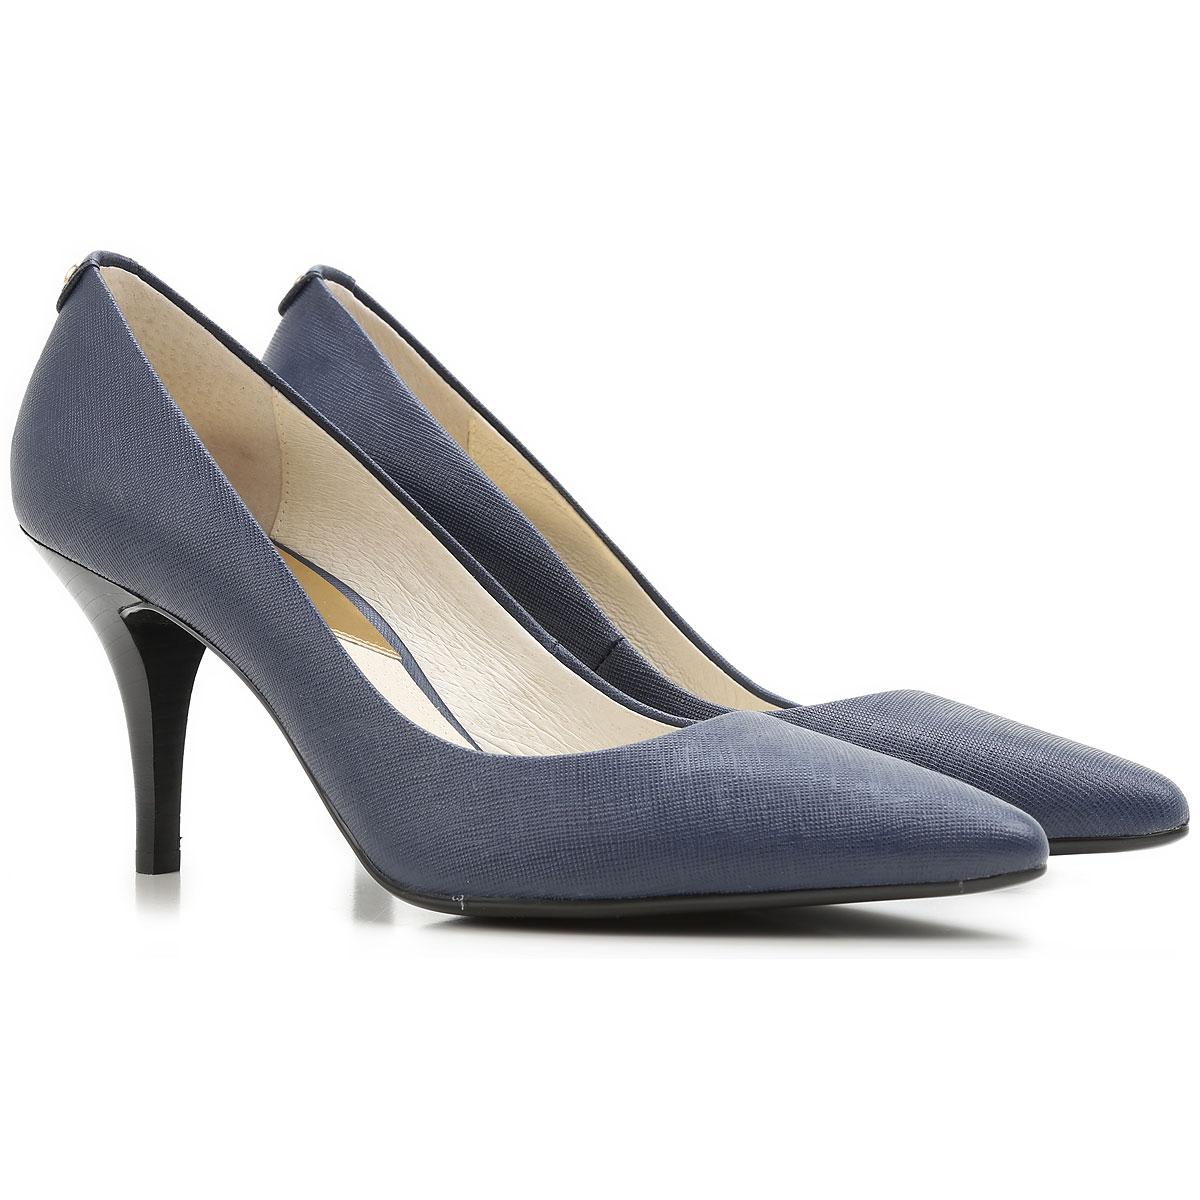 Replica Michael Kors Womens Shoes